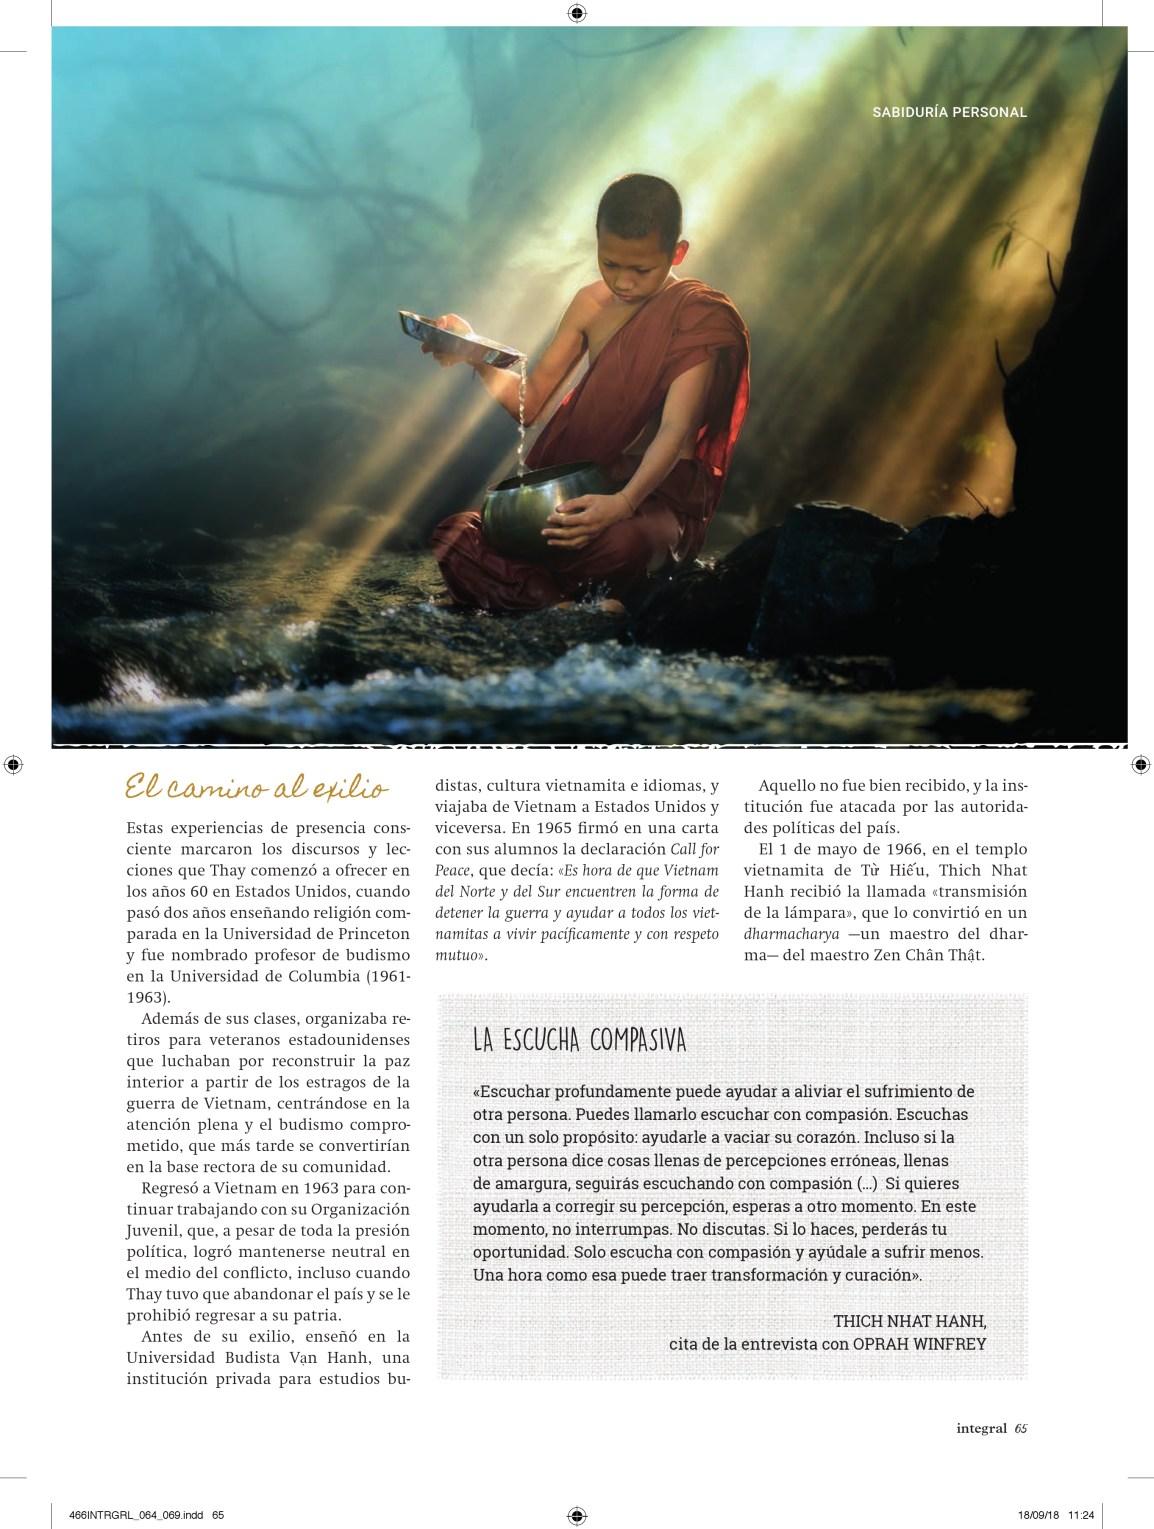 466INTRGRL_064_069-Thich Nhat Hanh_000002